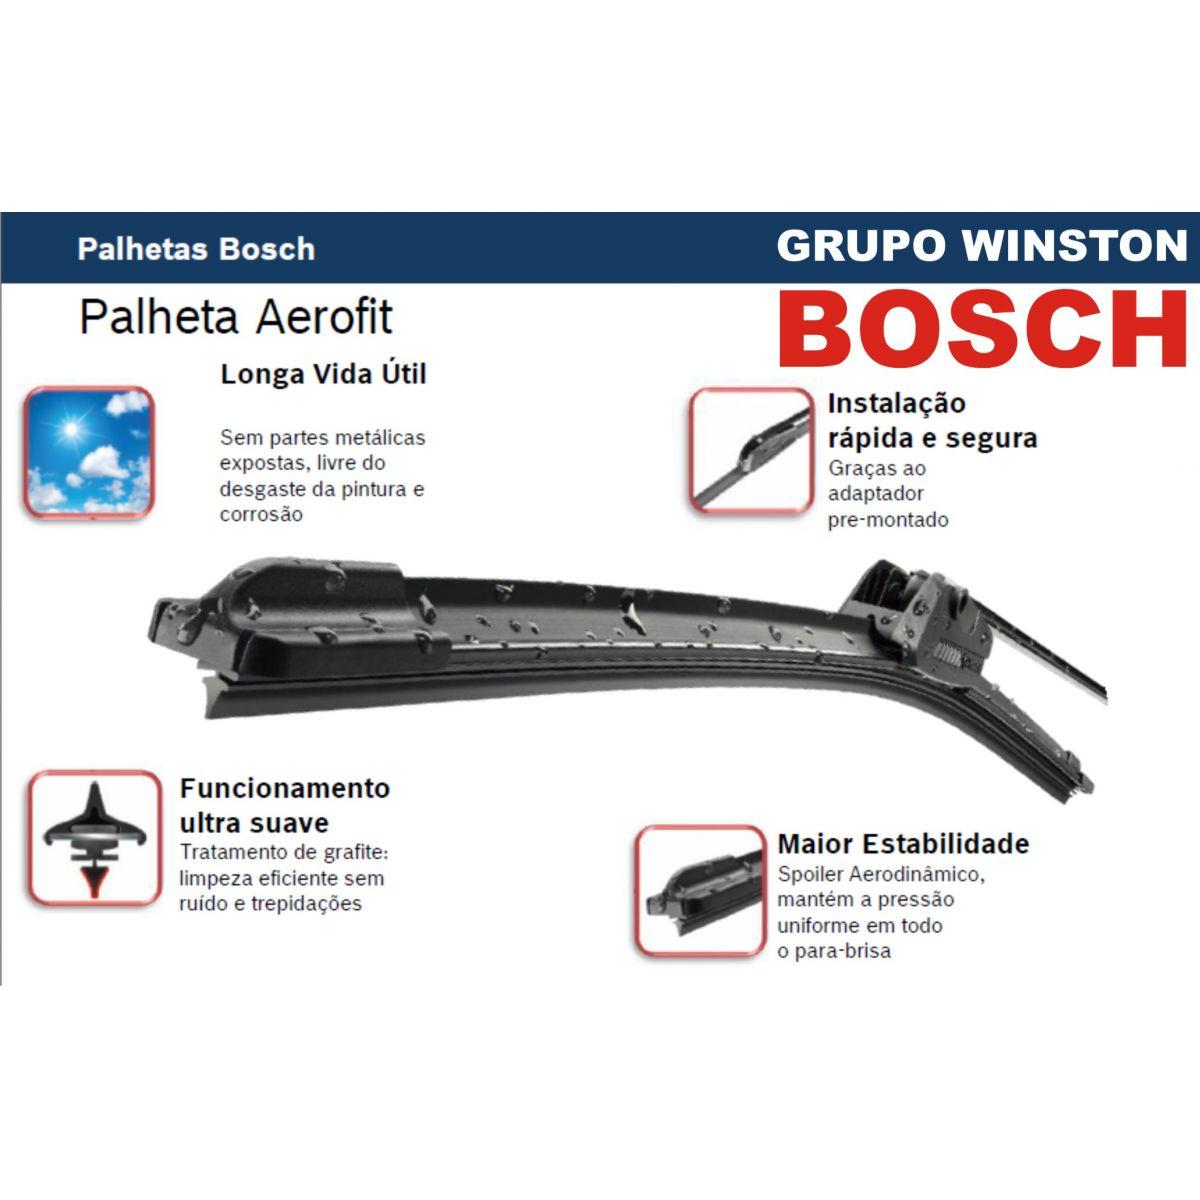 Palheta Bosch Aerofit Limpador de para brisa Bosch CITROEN C8 Xsara Picasso